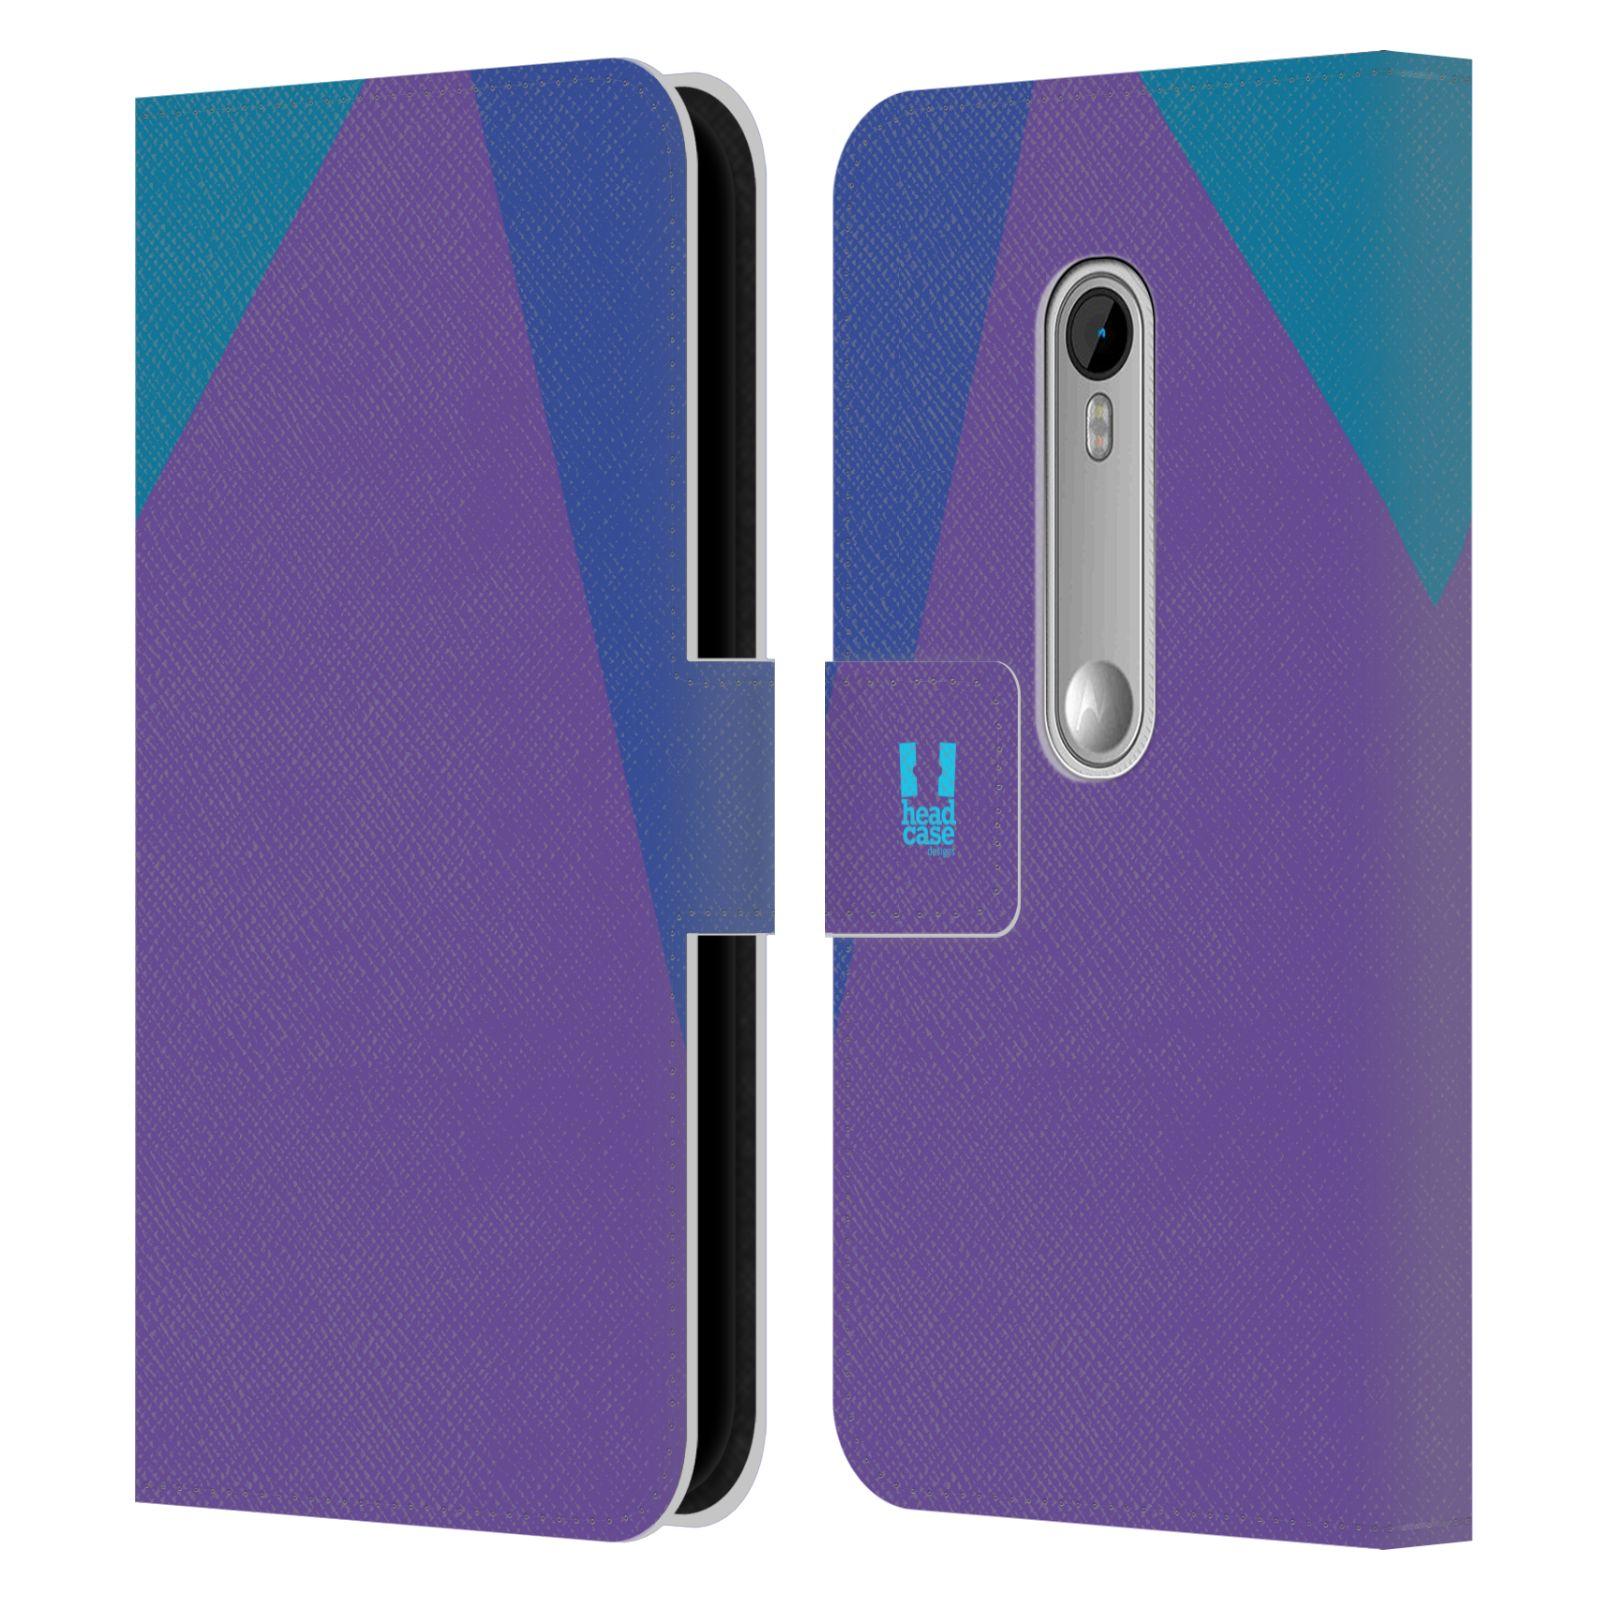 HEAD CASE Flipové pouzdro pro mobil Motorola MOTO G 3RD GENERATION barevné tvary fialová feminine